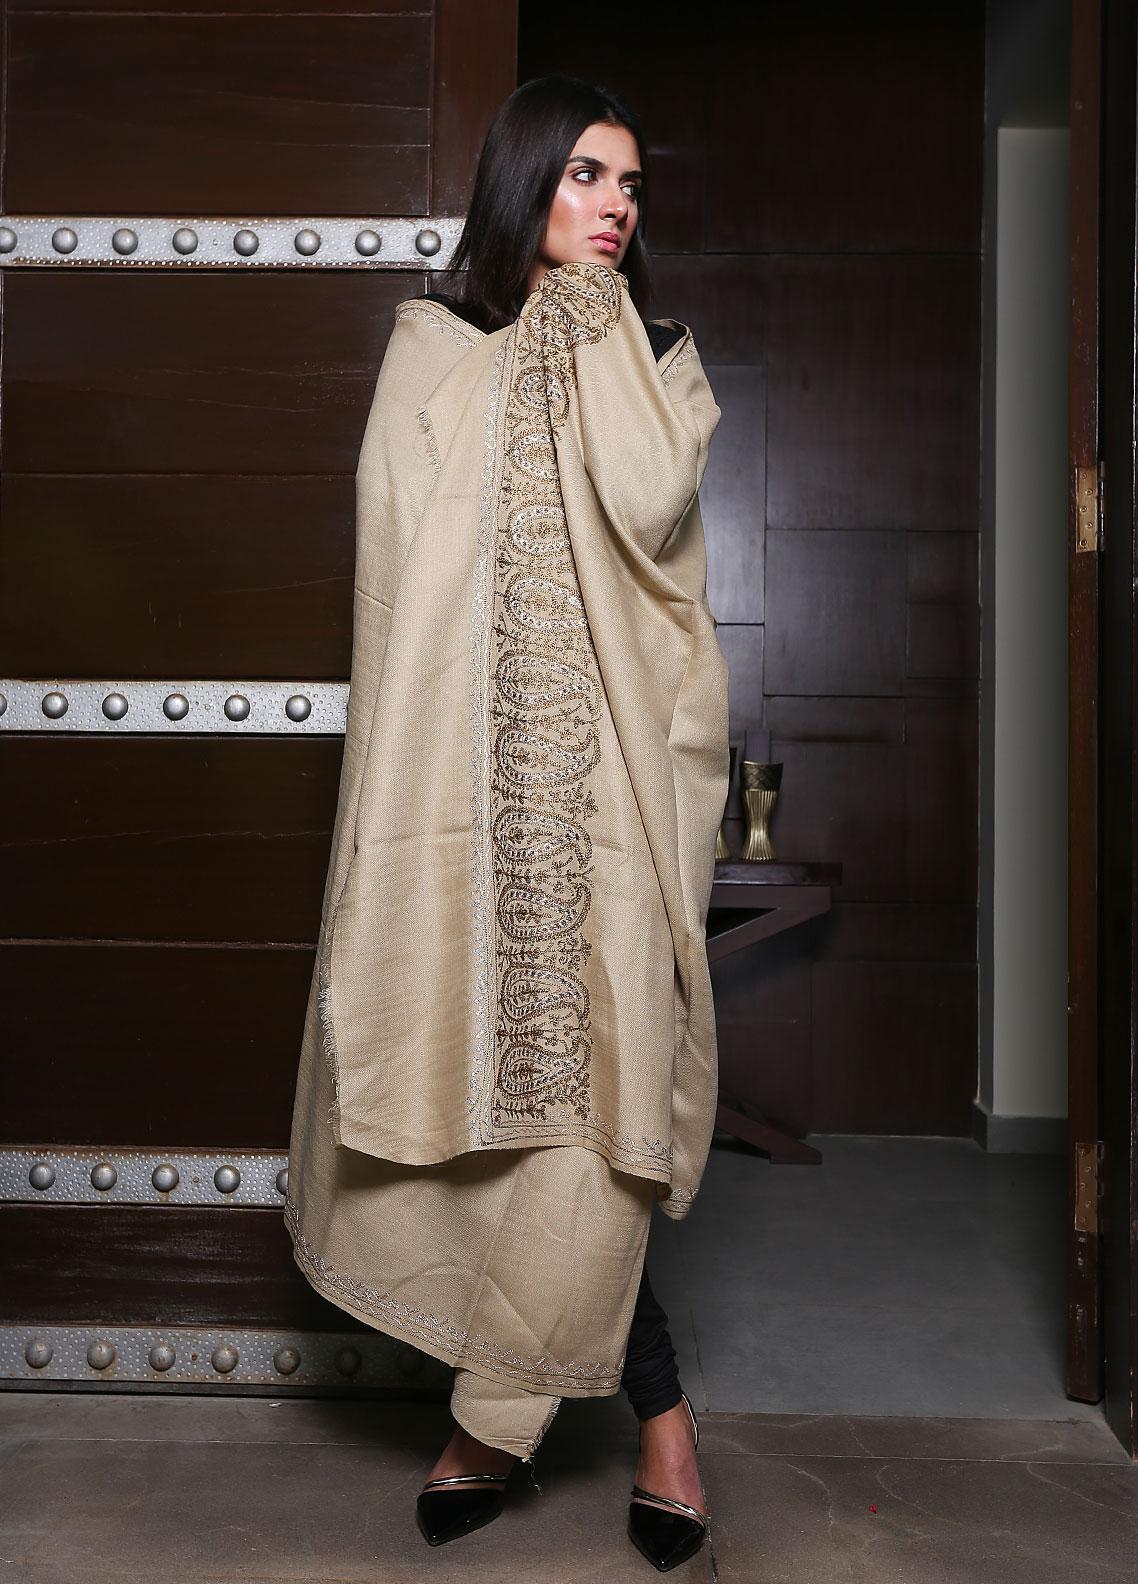 Sanaulla Exclusive Range Embroidered Pashmina  Shawl 19-MIR-96 Beige - Kashmiri Shawls